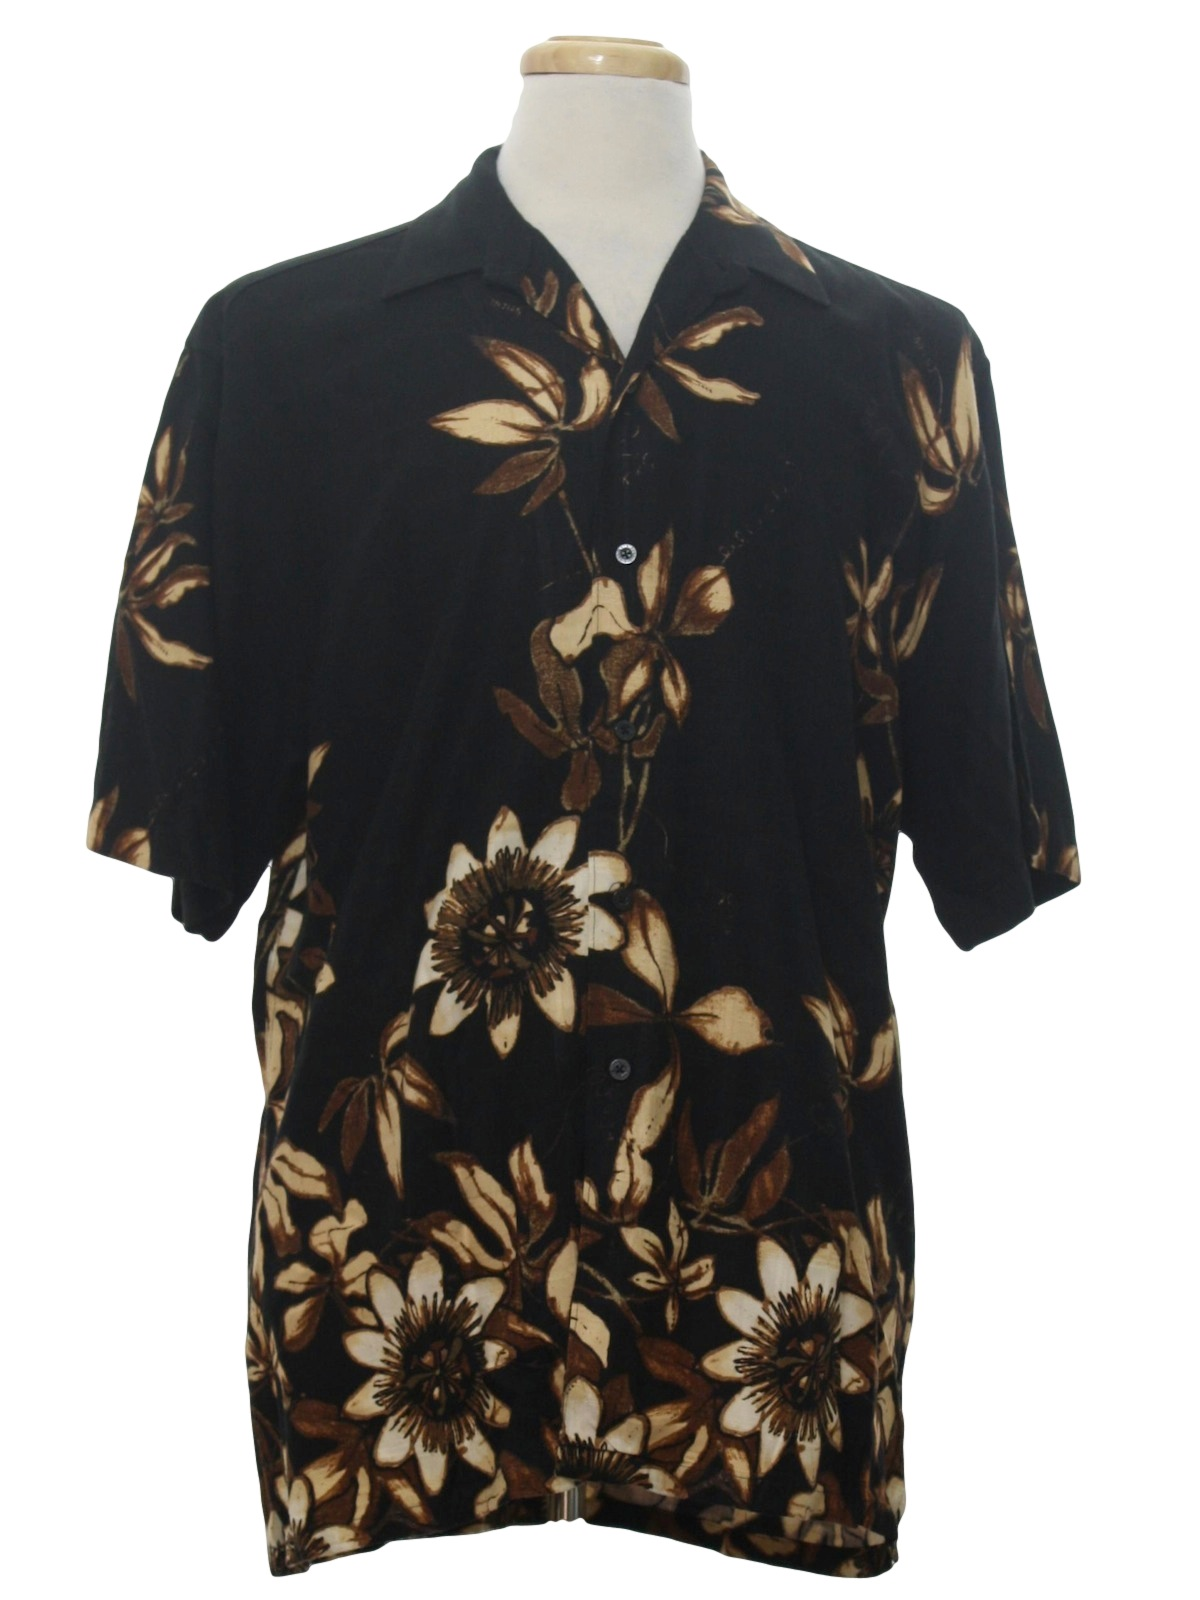 3bbd9a9bd Vintage 1990's Hawaiian Shirt: 90s -Cubavera- Mens black plaid ...